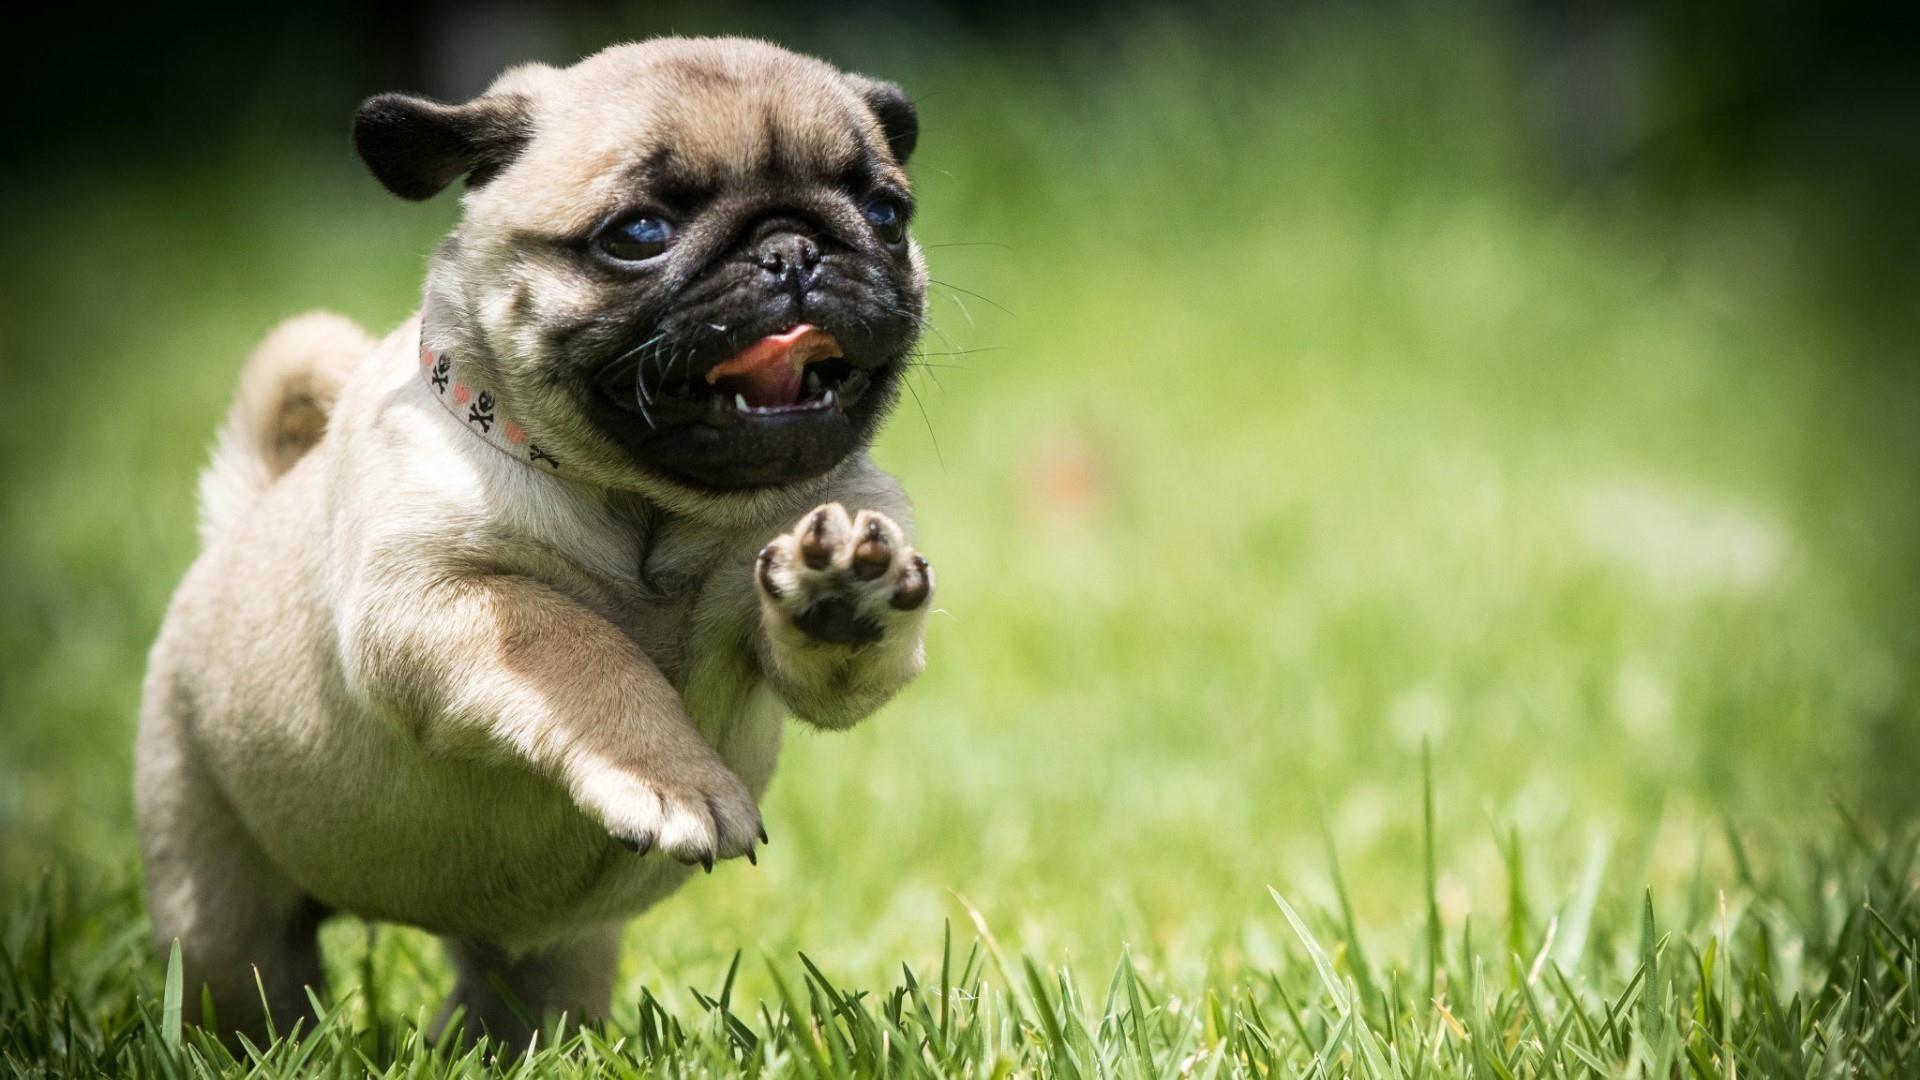 Free Pug Dogs